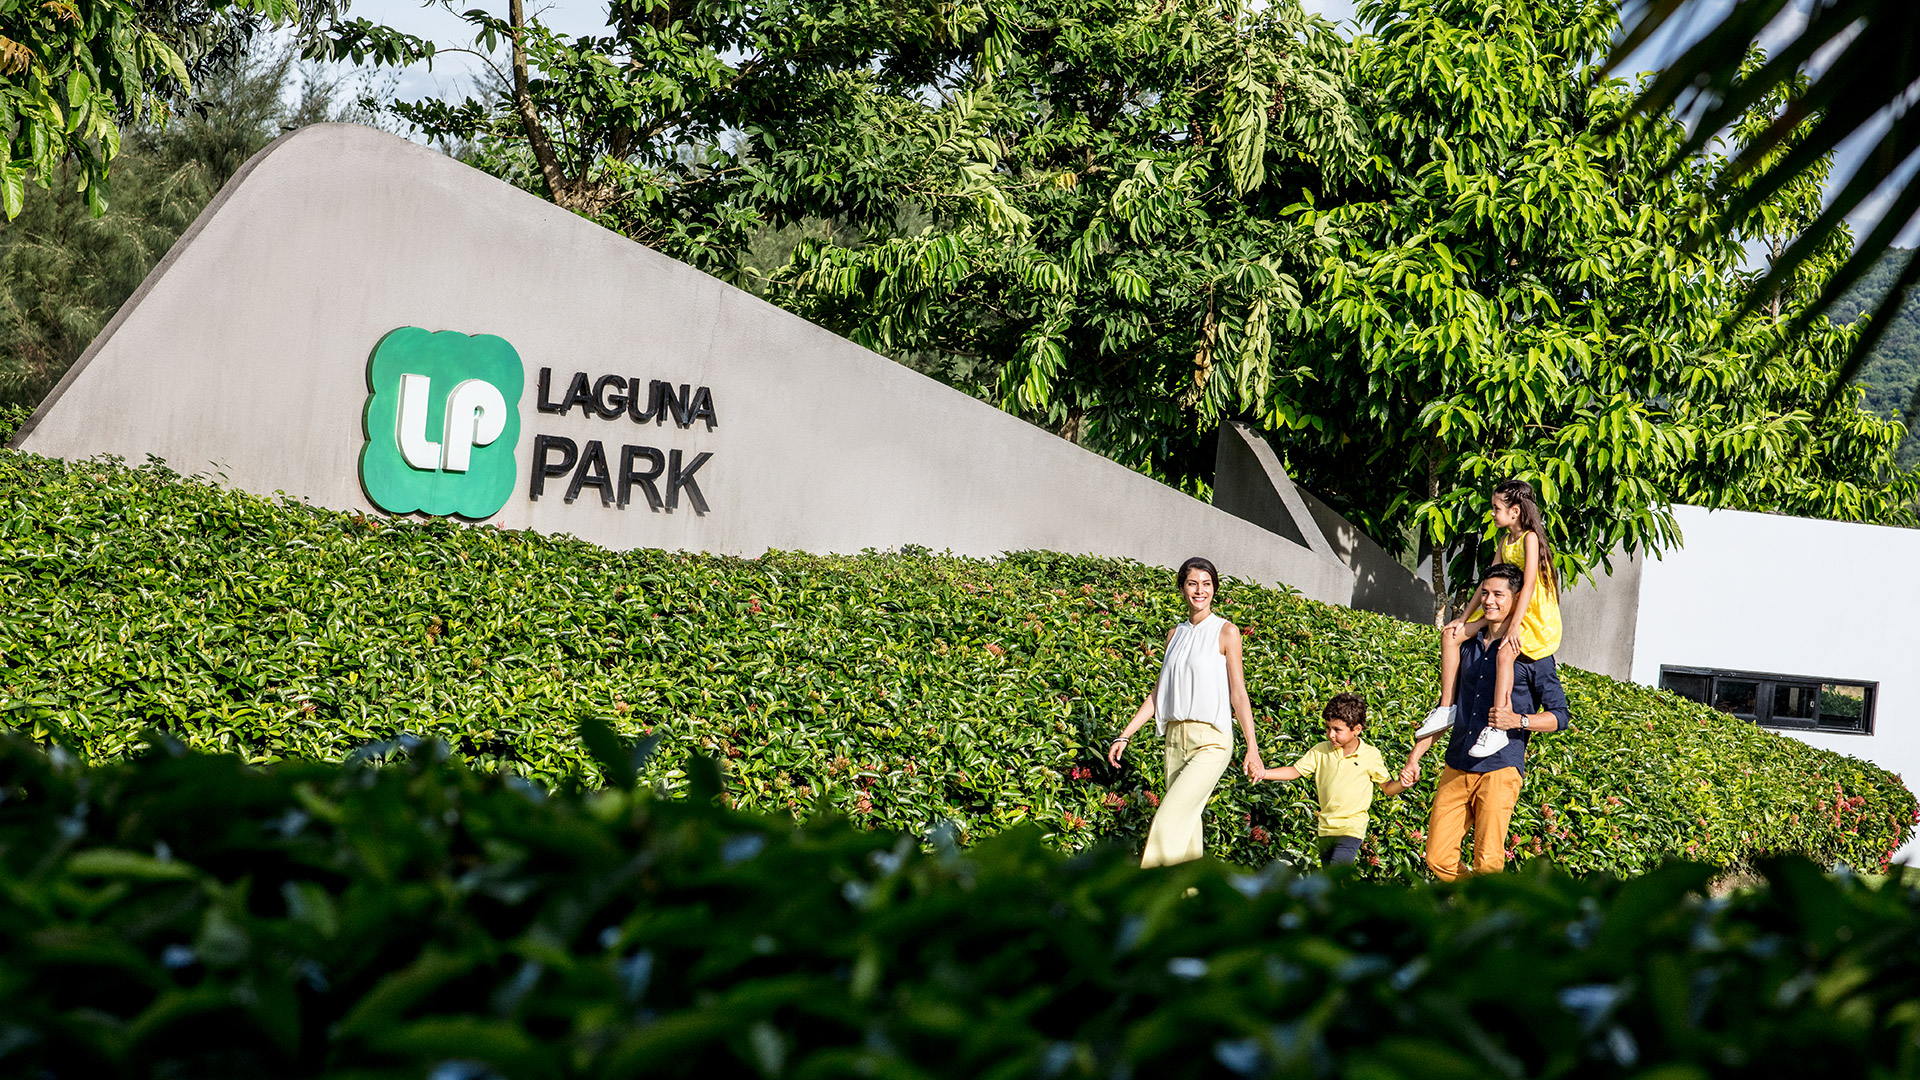 Giá ưu đãi tại Laguna Park